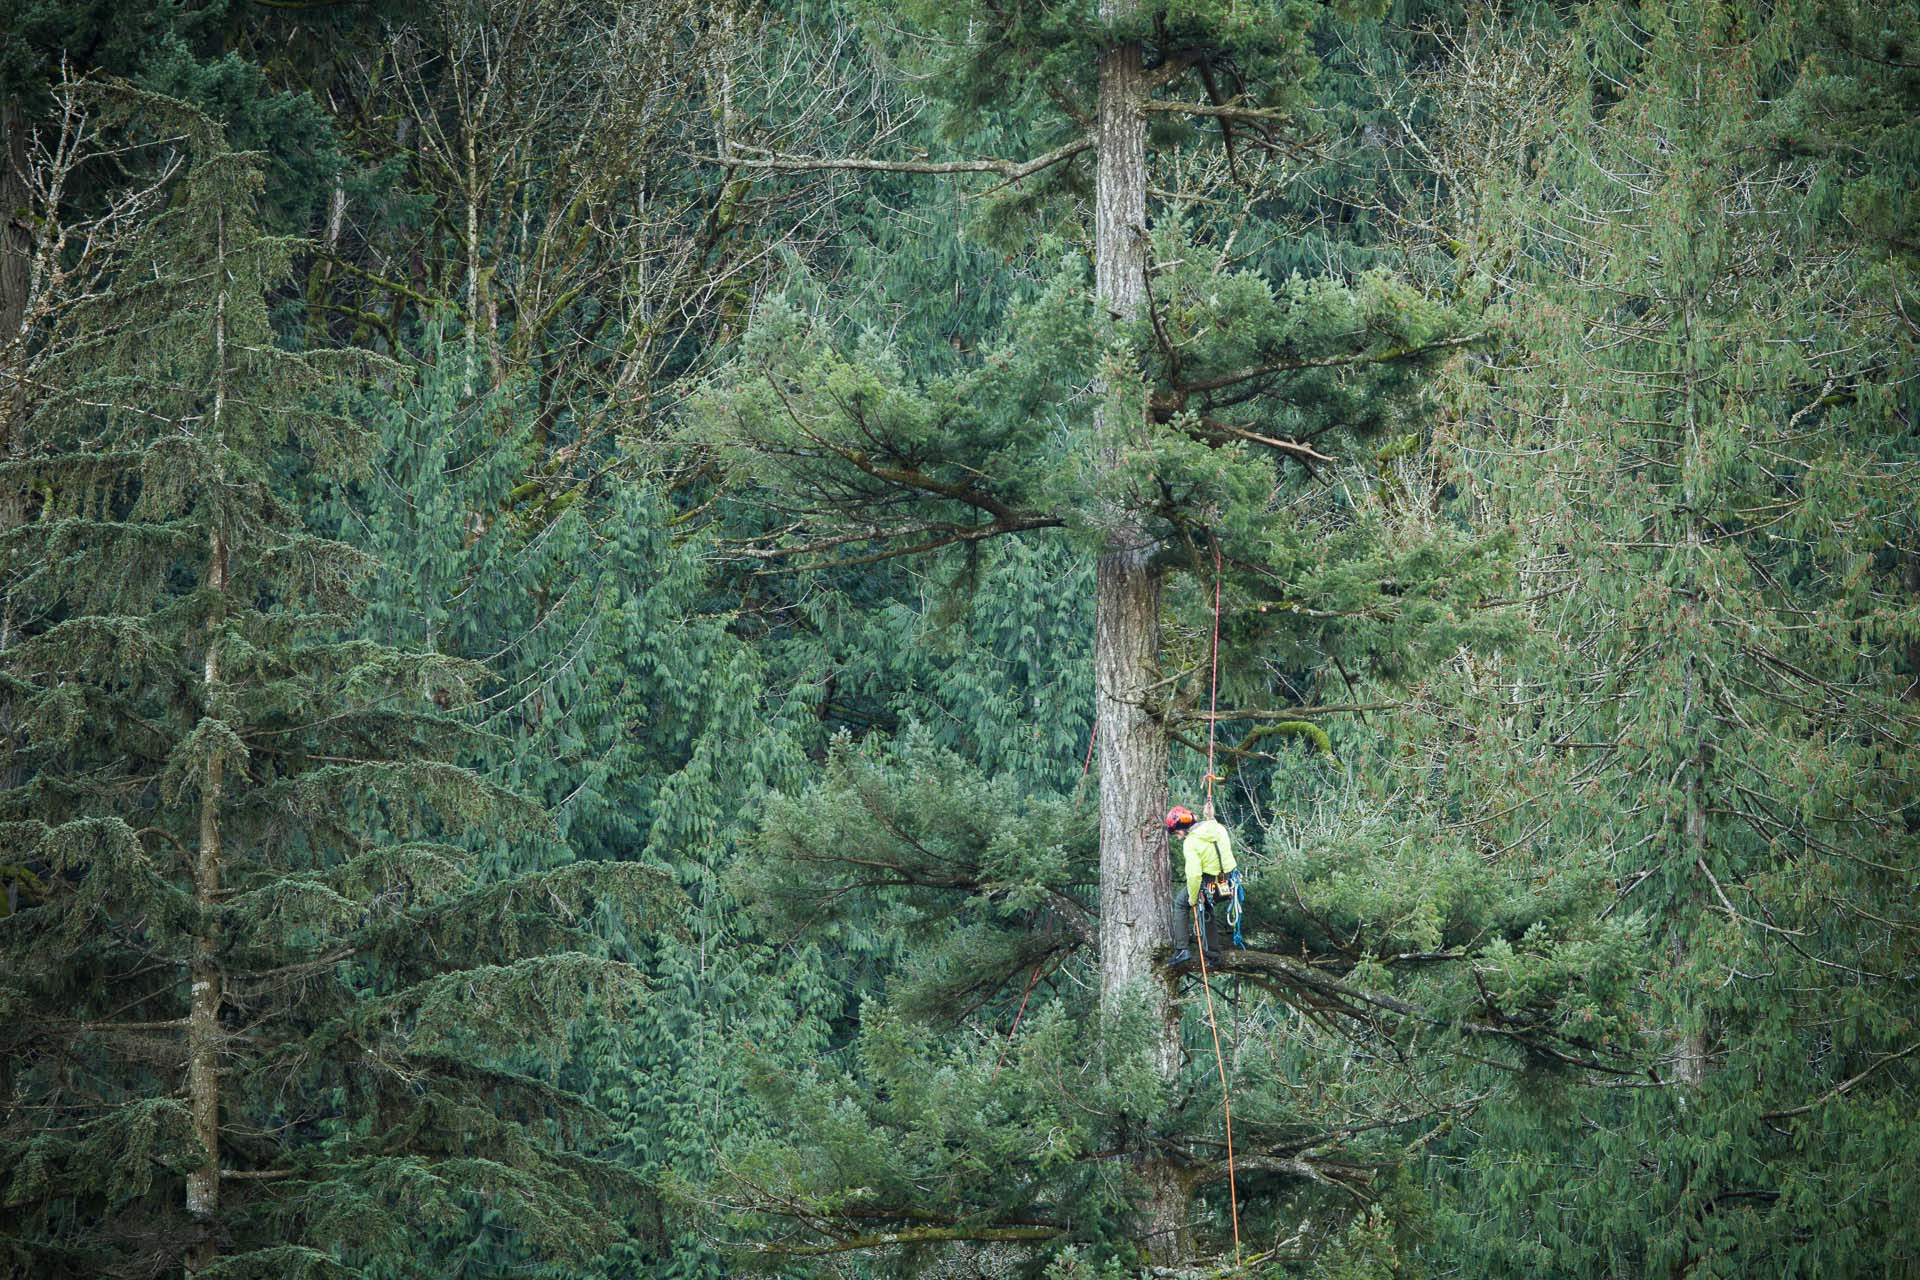 tree-climbing-at-echo-lake.jpg